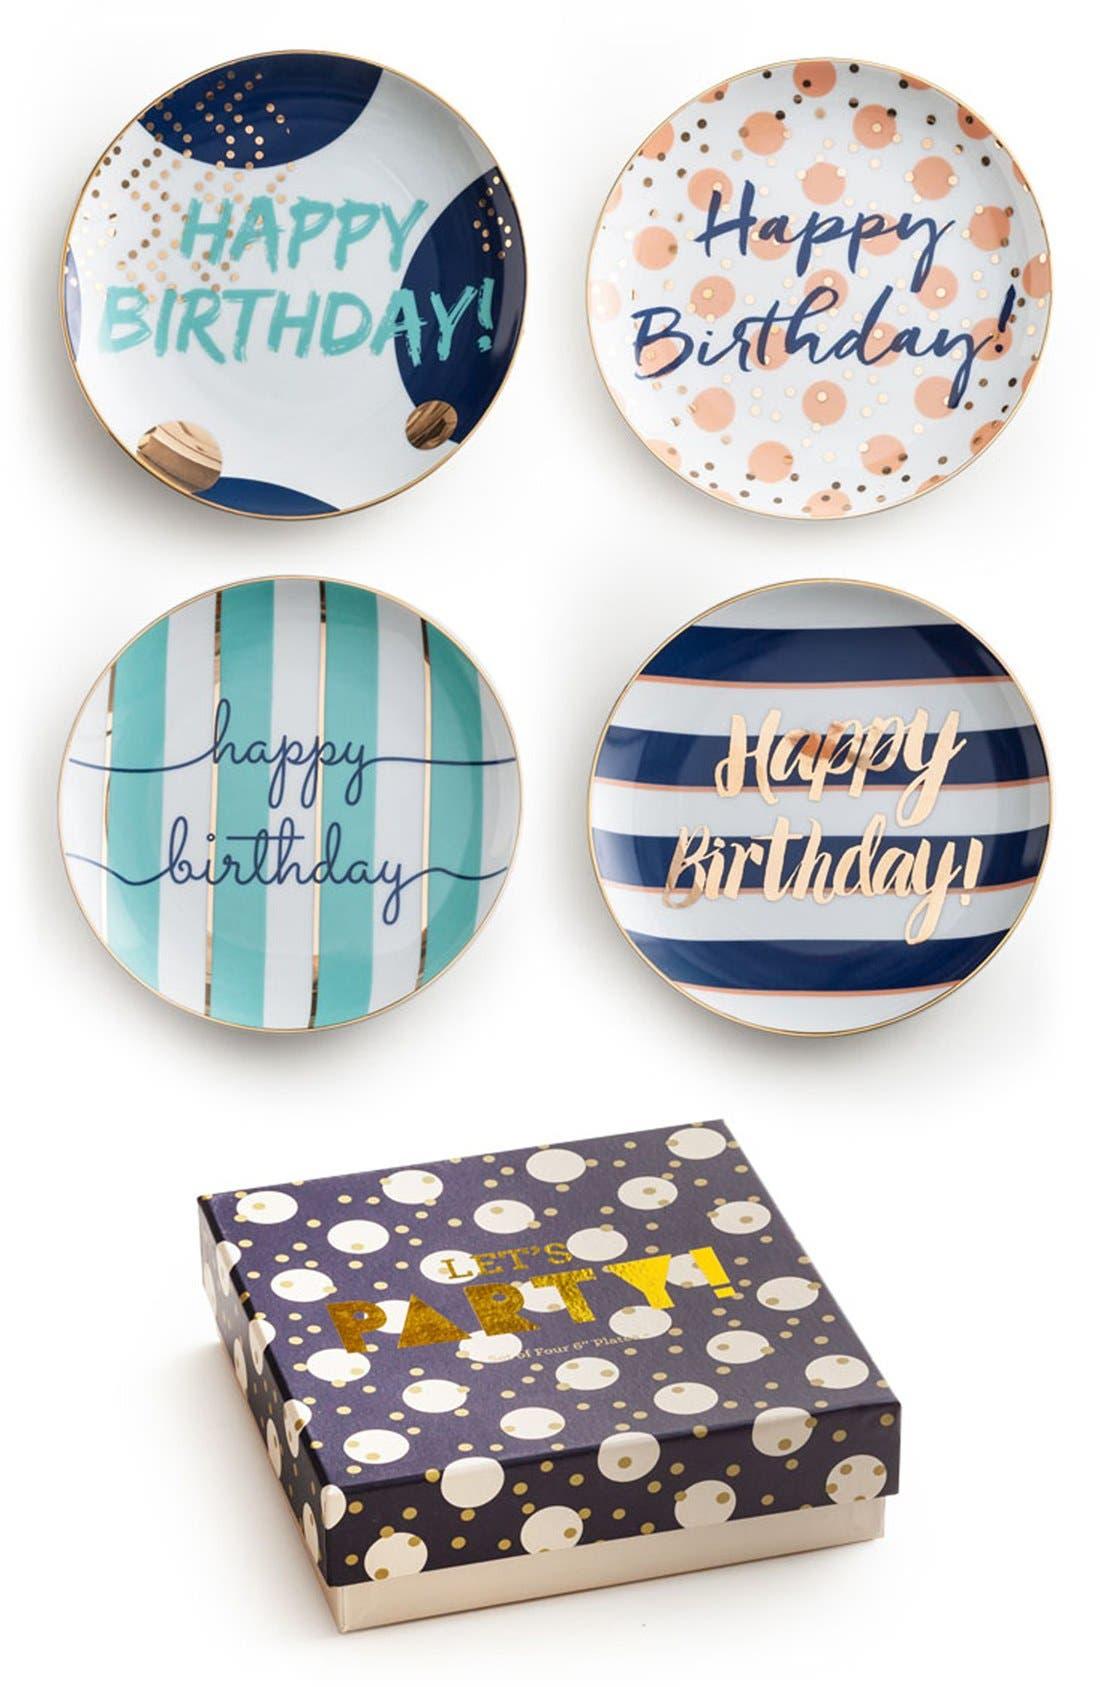 ROSANNA 'Happy Birthday' Porcelain Plates